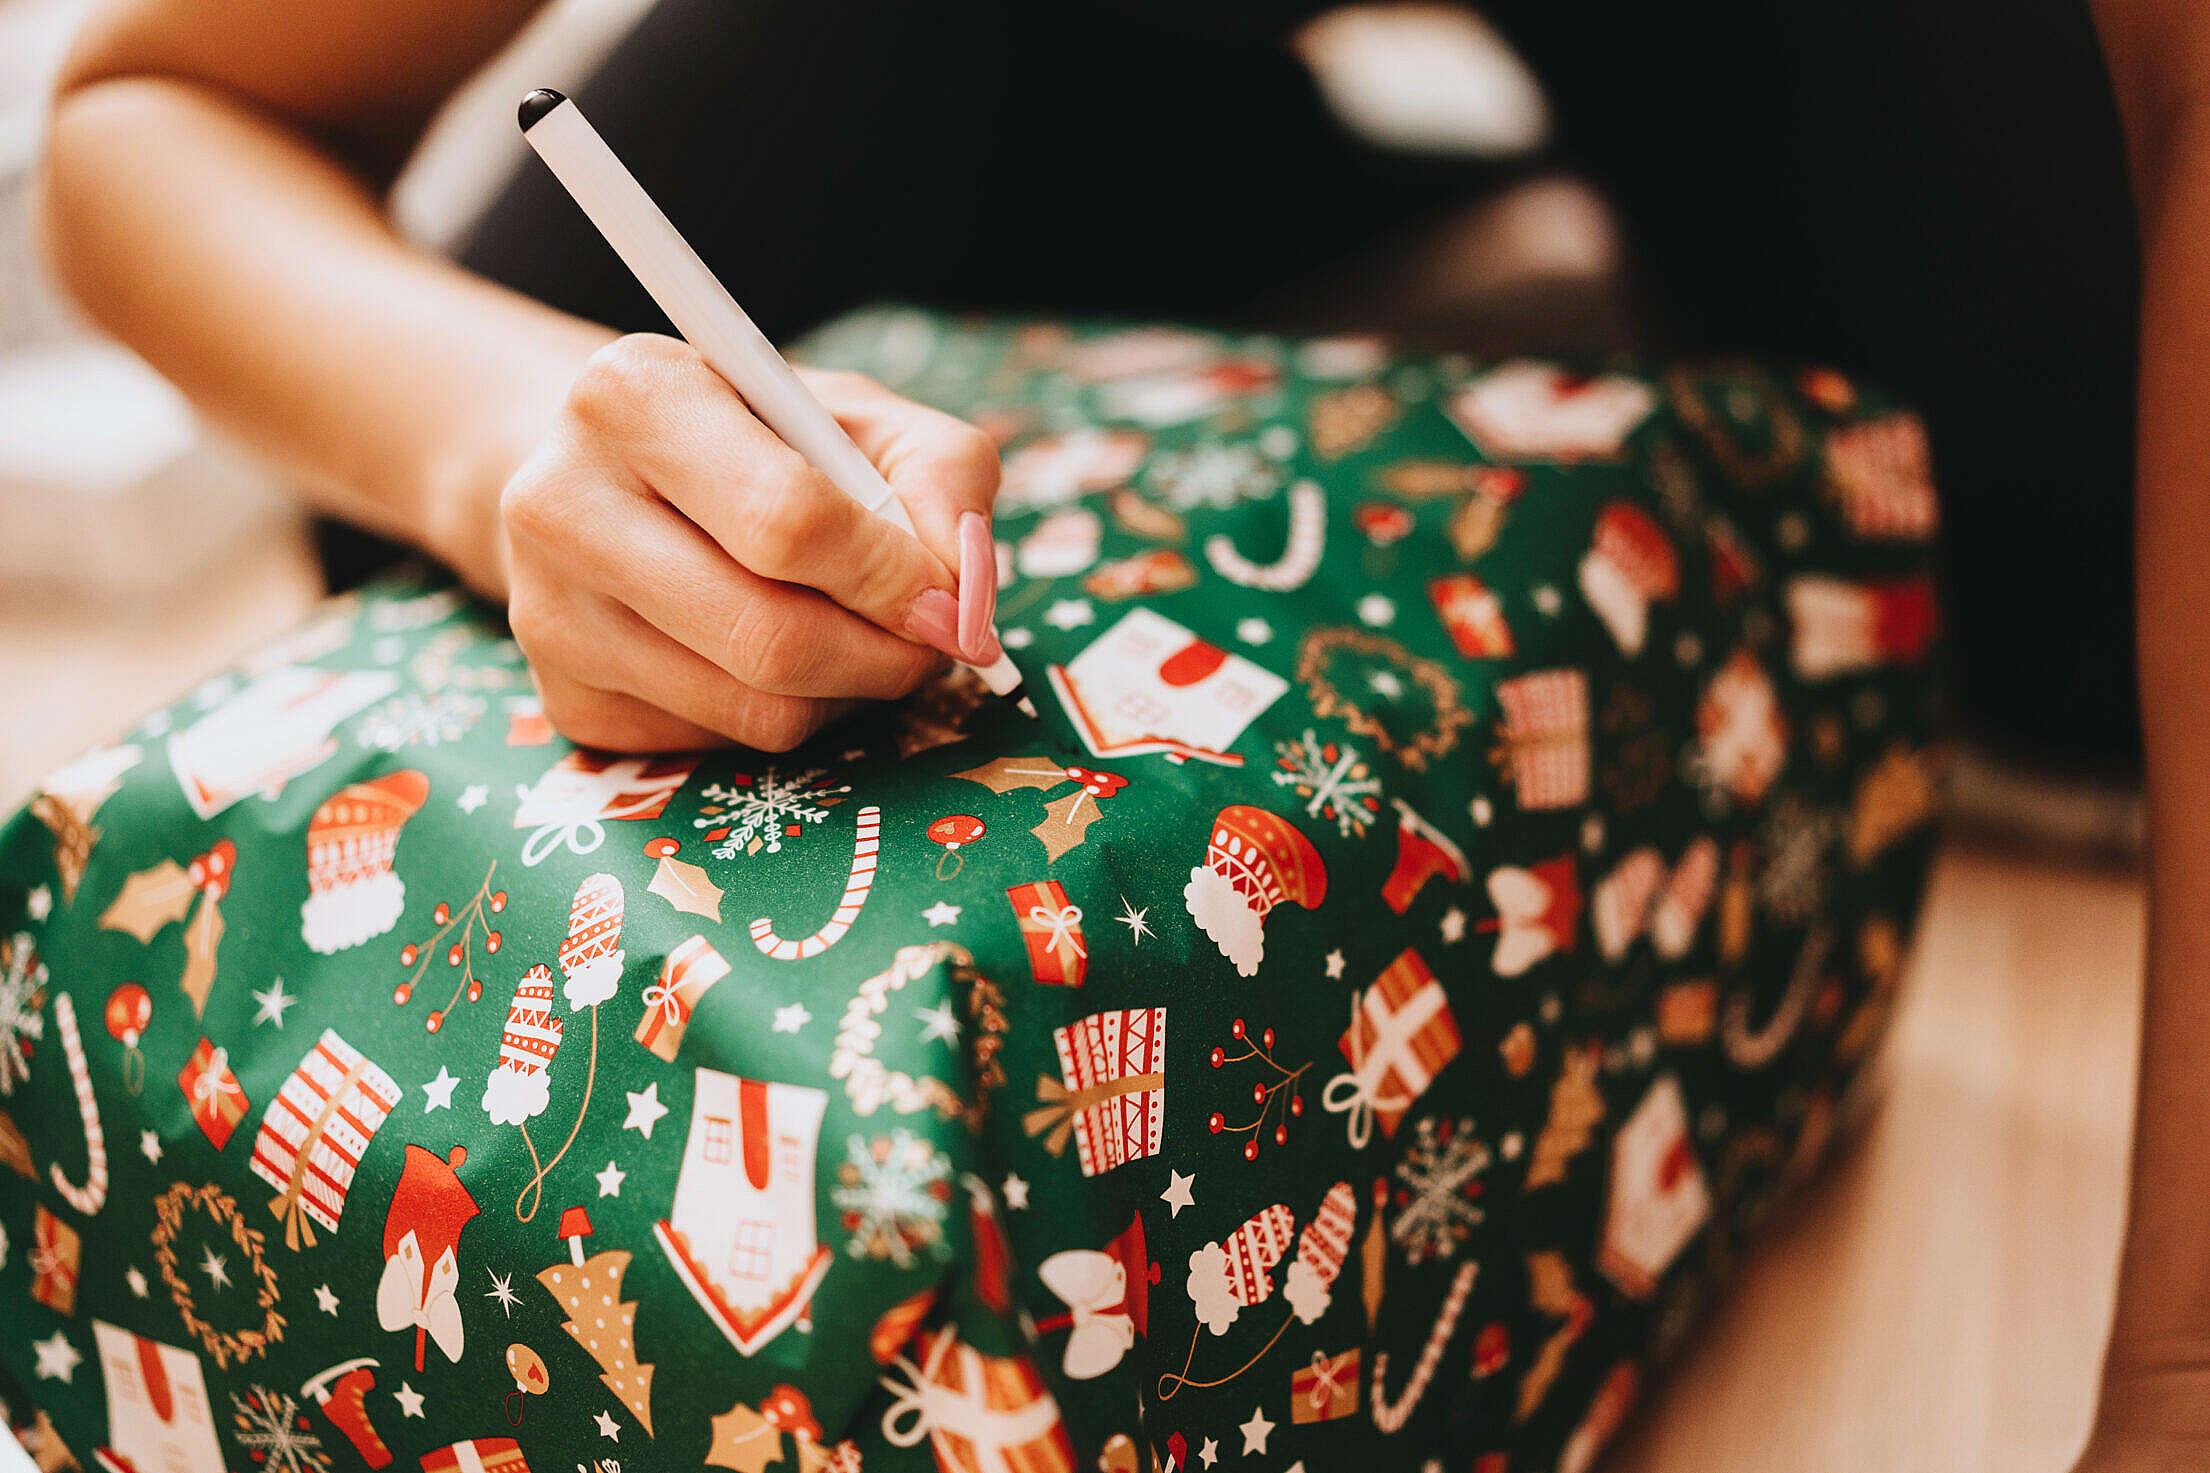 Woman Writing a Name on a Christmas Present Free Stock Photo